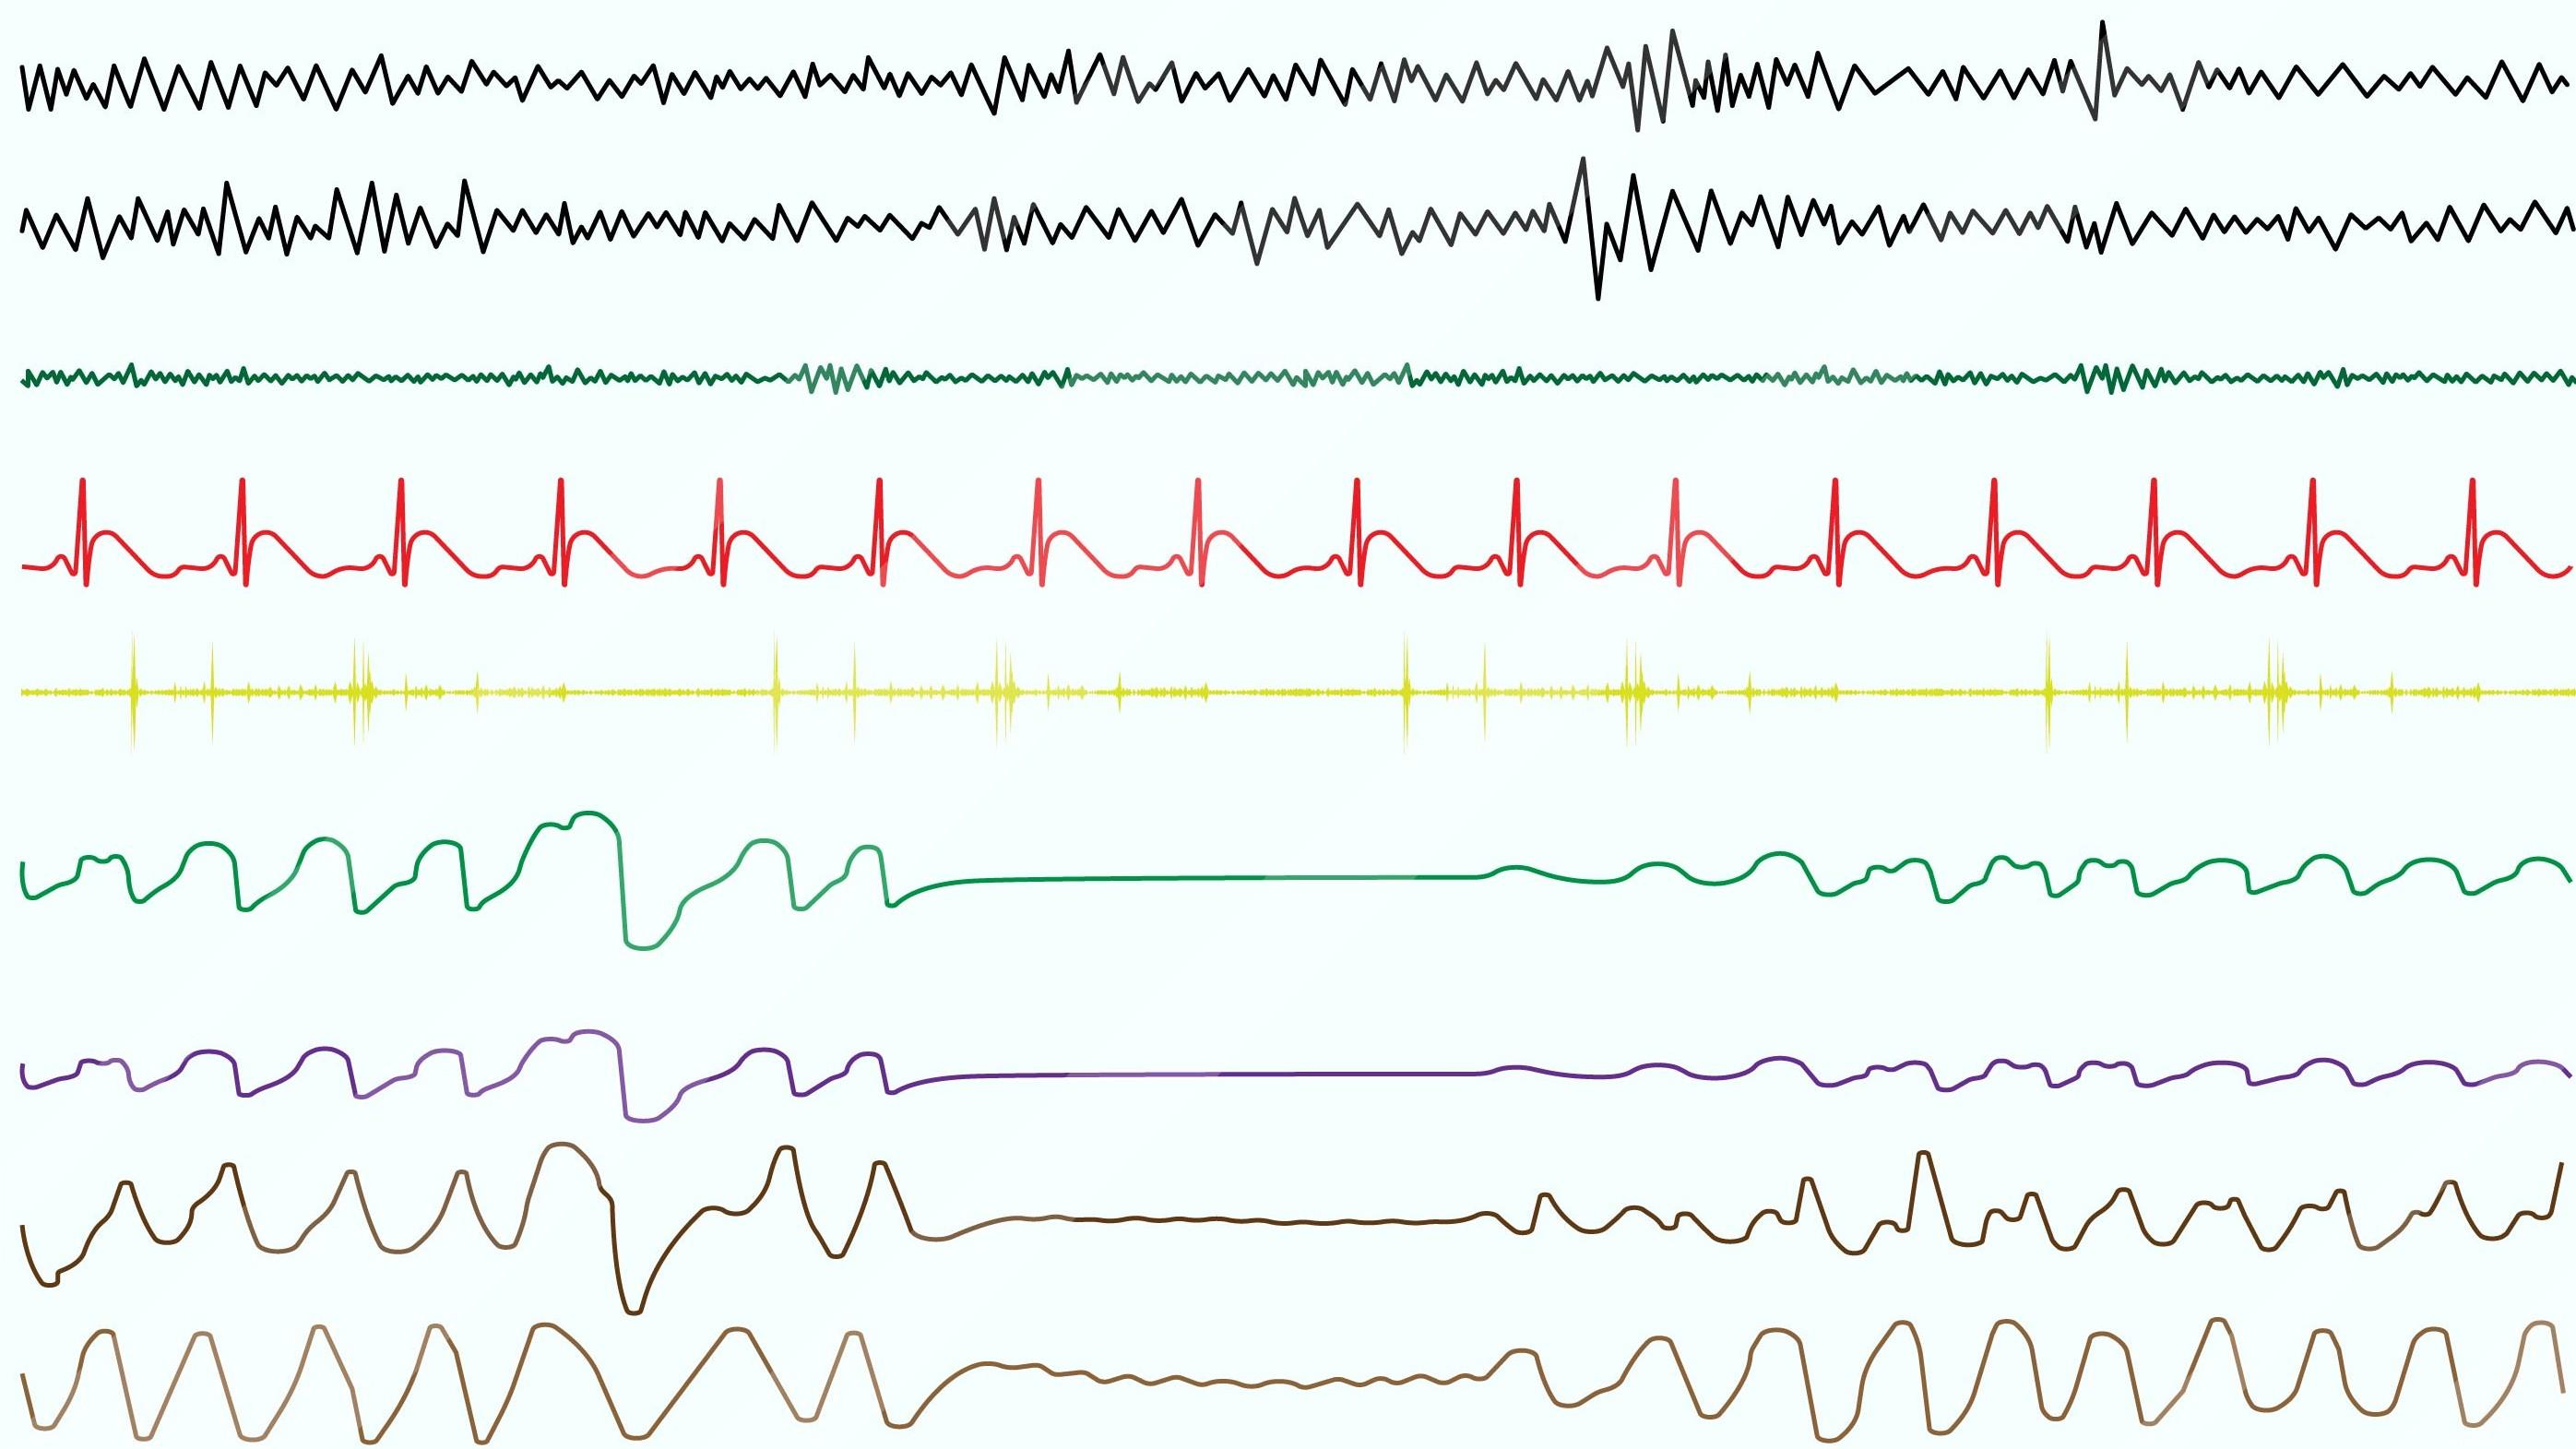 Sleep Apnea: Screening, Testing and Treatment - SnoreLab